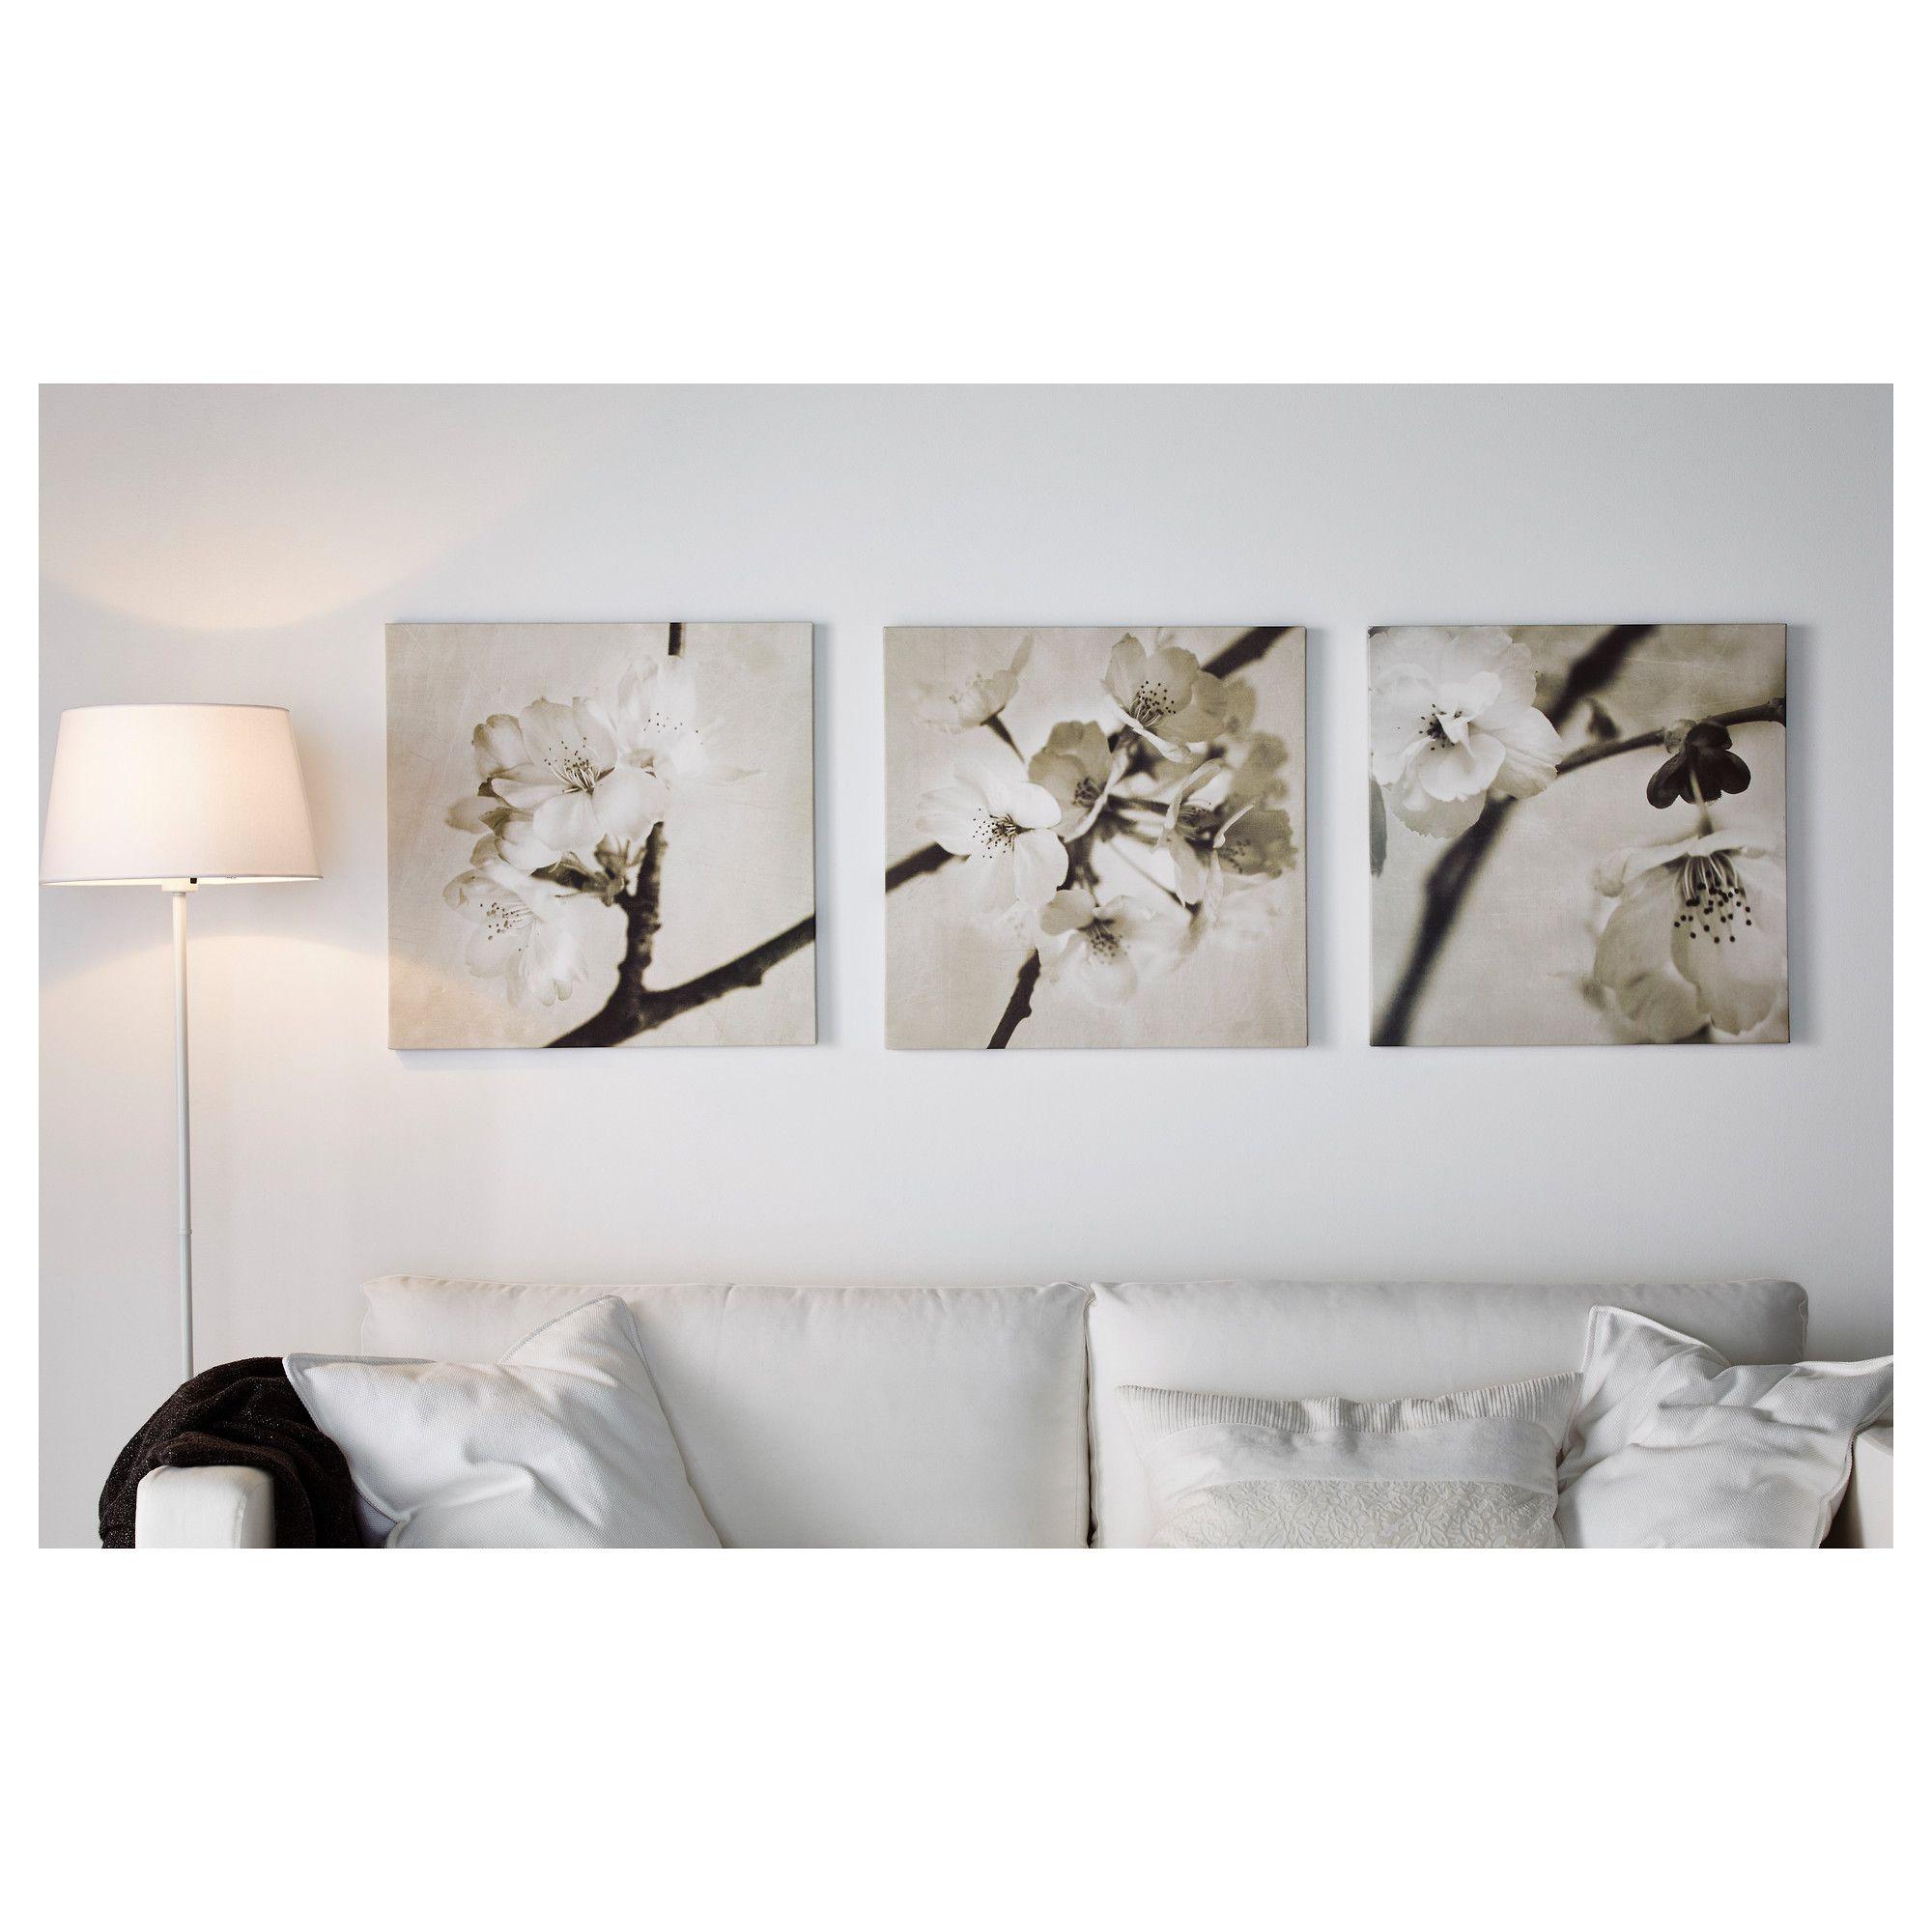 PJATTERYD Πόστερ, σετ 3 τεμ. - IKEA | home sweet home | Pinterest ...